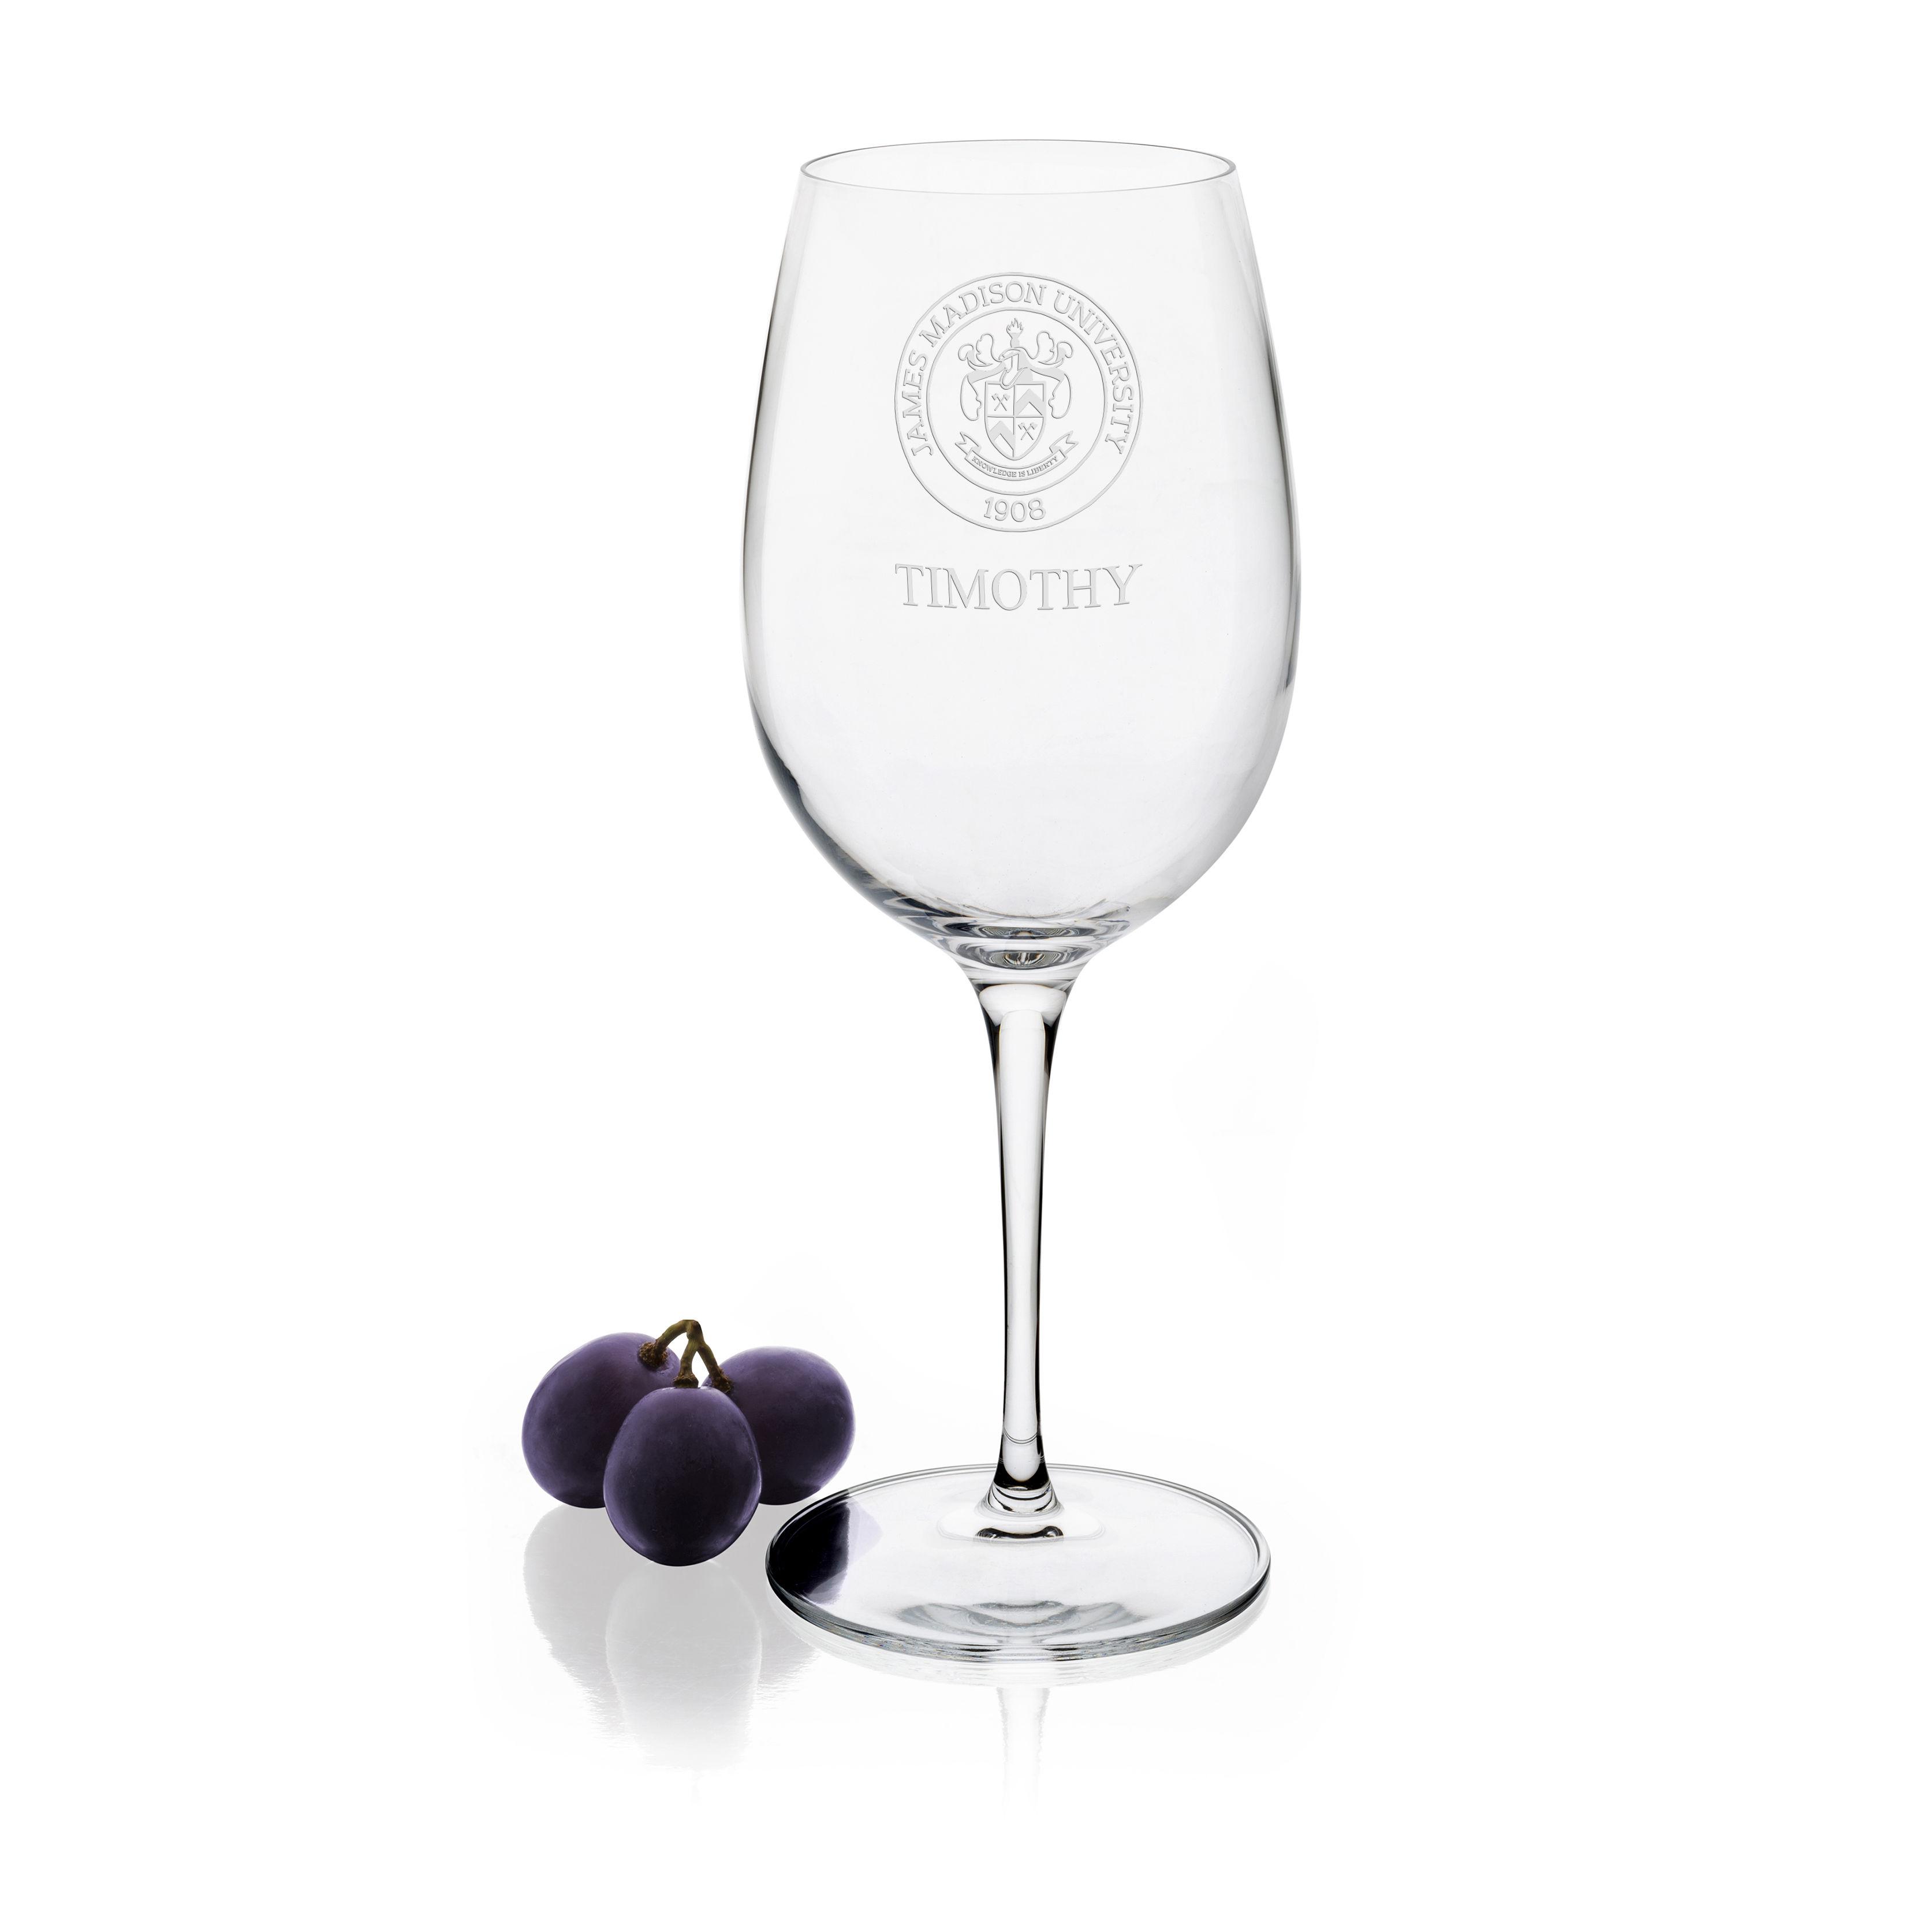 James Madison University Red Wine Glasses - Set of 4